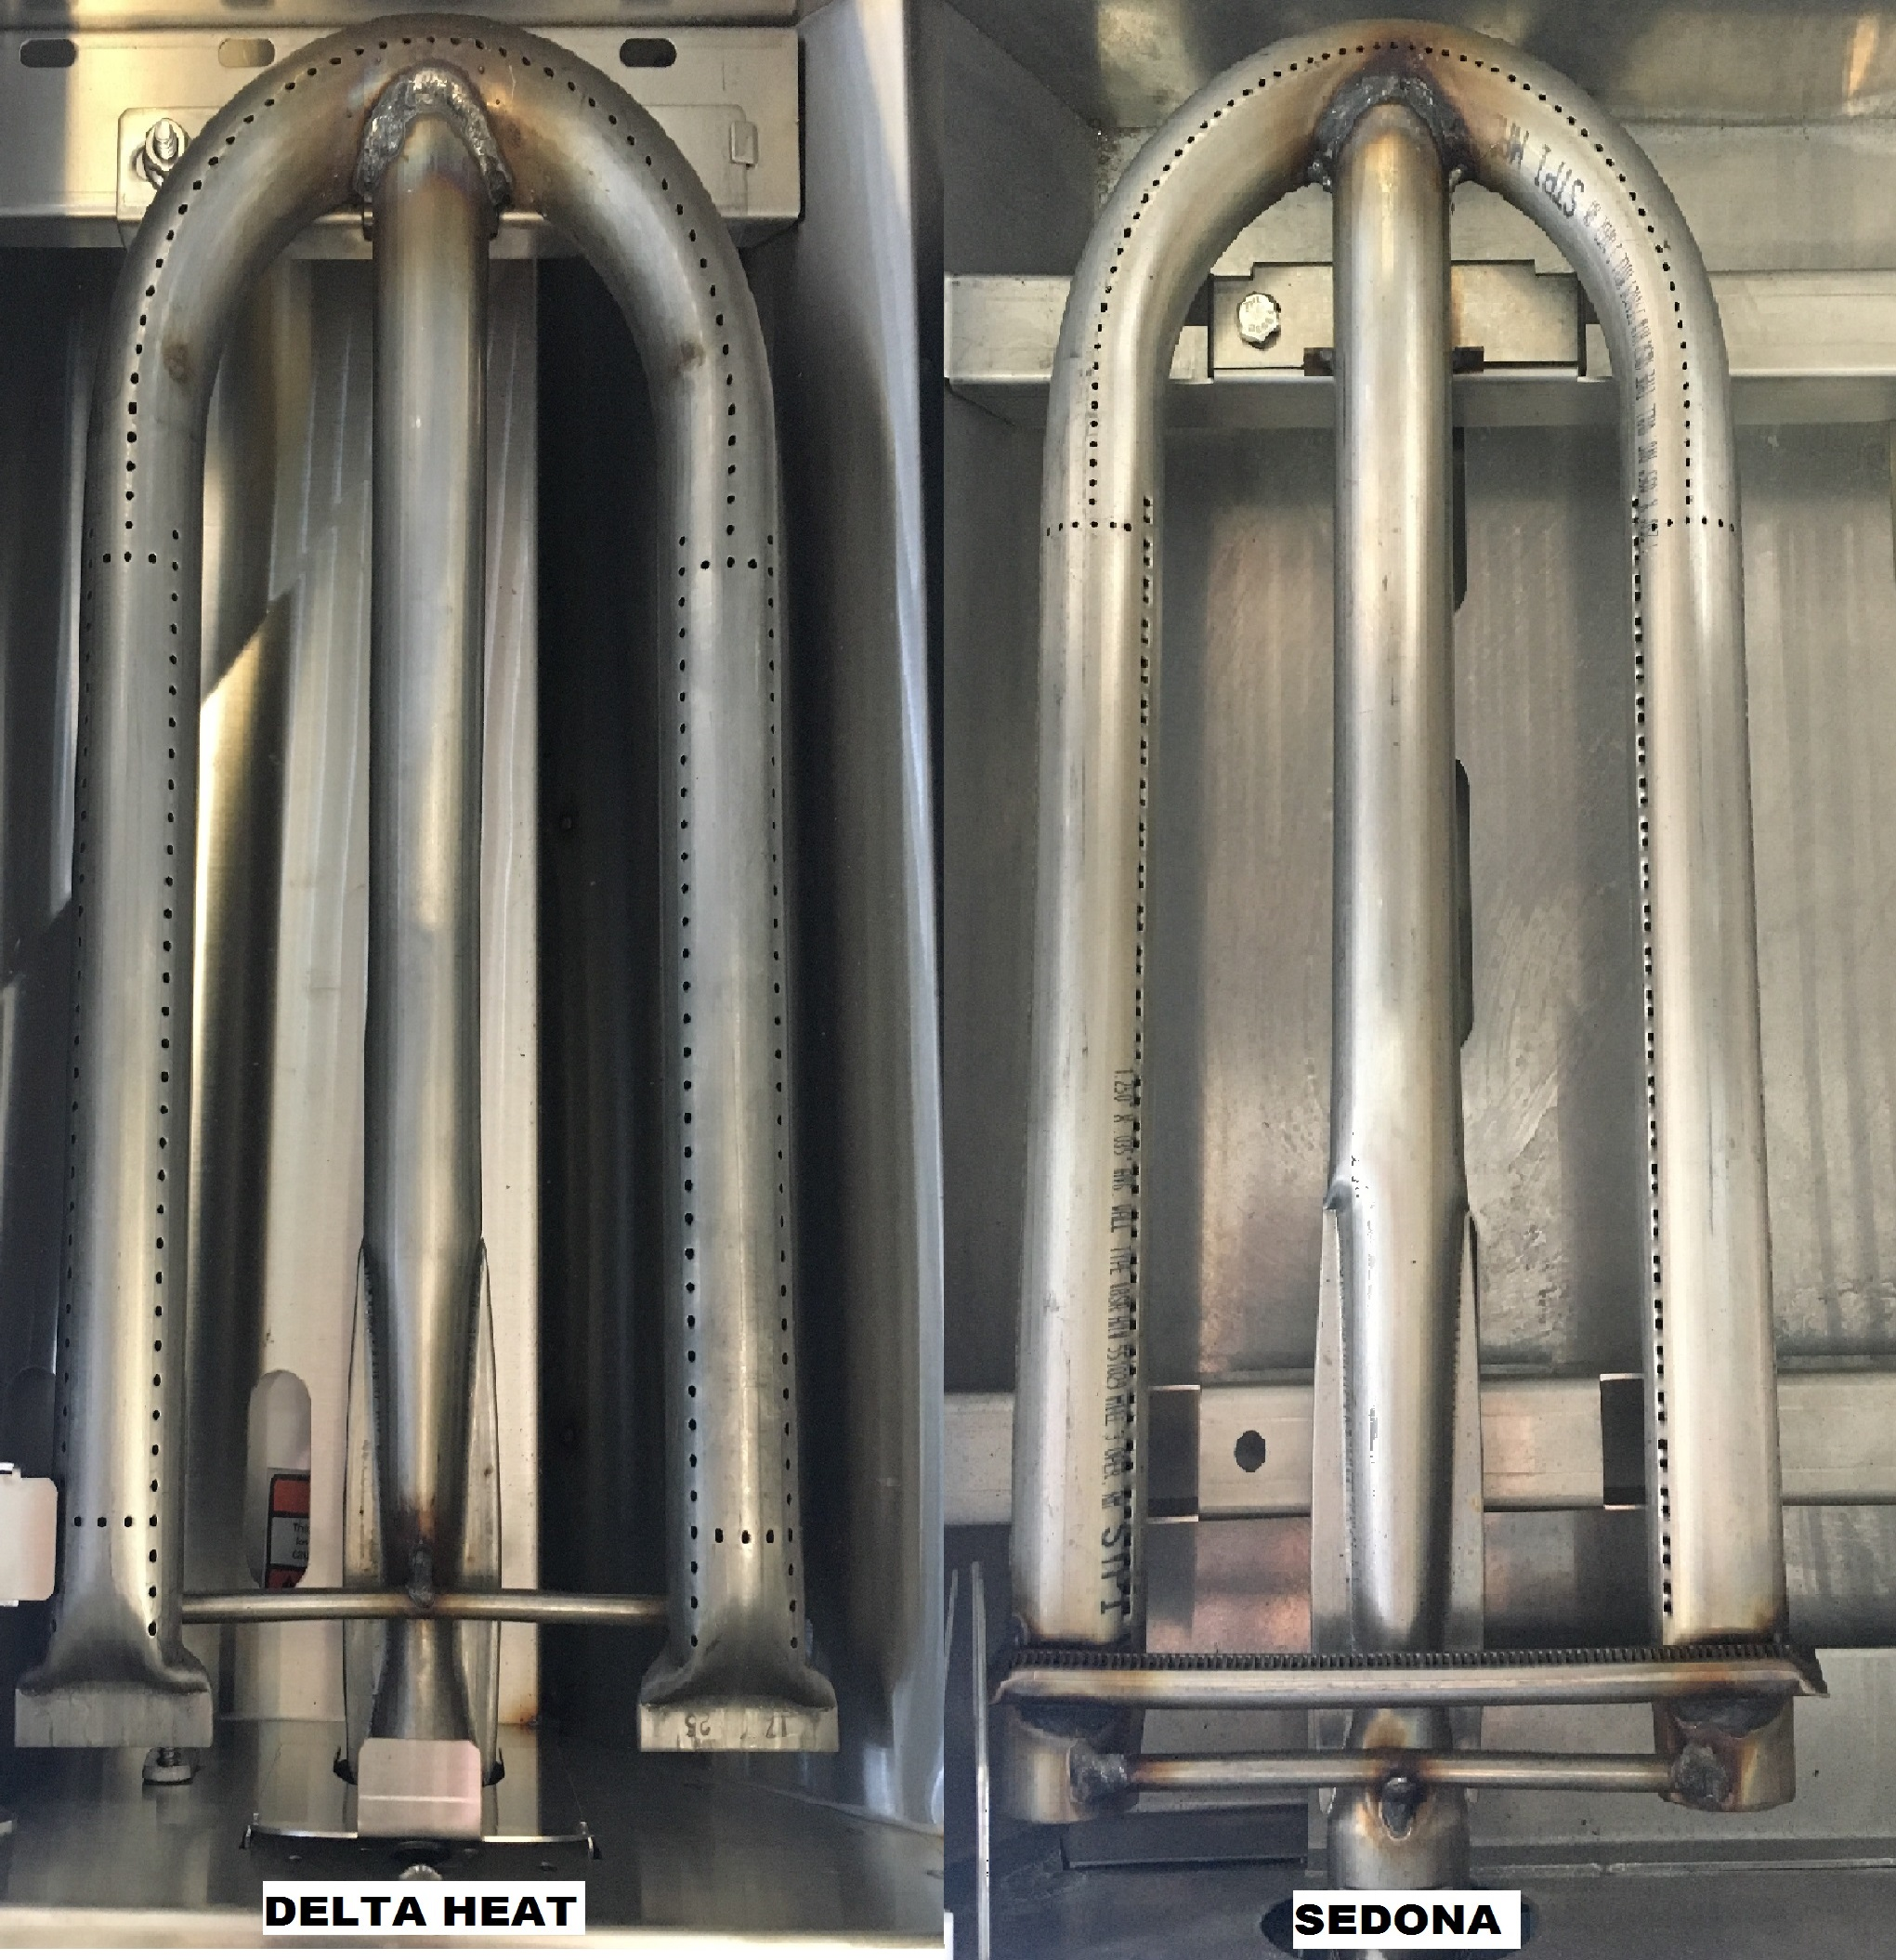 Delta Heat Burner vs Sedona Burner